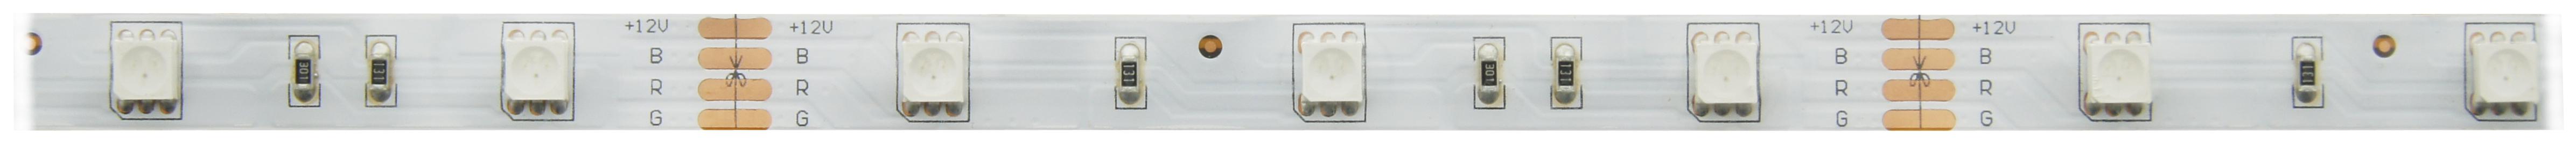 1 Stk Flexstrip 36 RGB 100% Mix, 7,4W/m, 245lm/m, 12VDC, IP44 l=5m LIFS007005